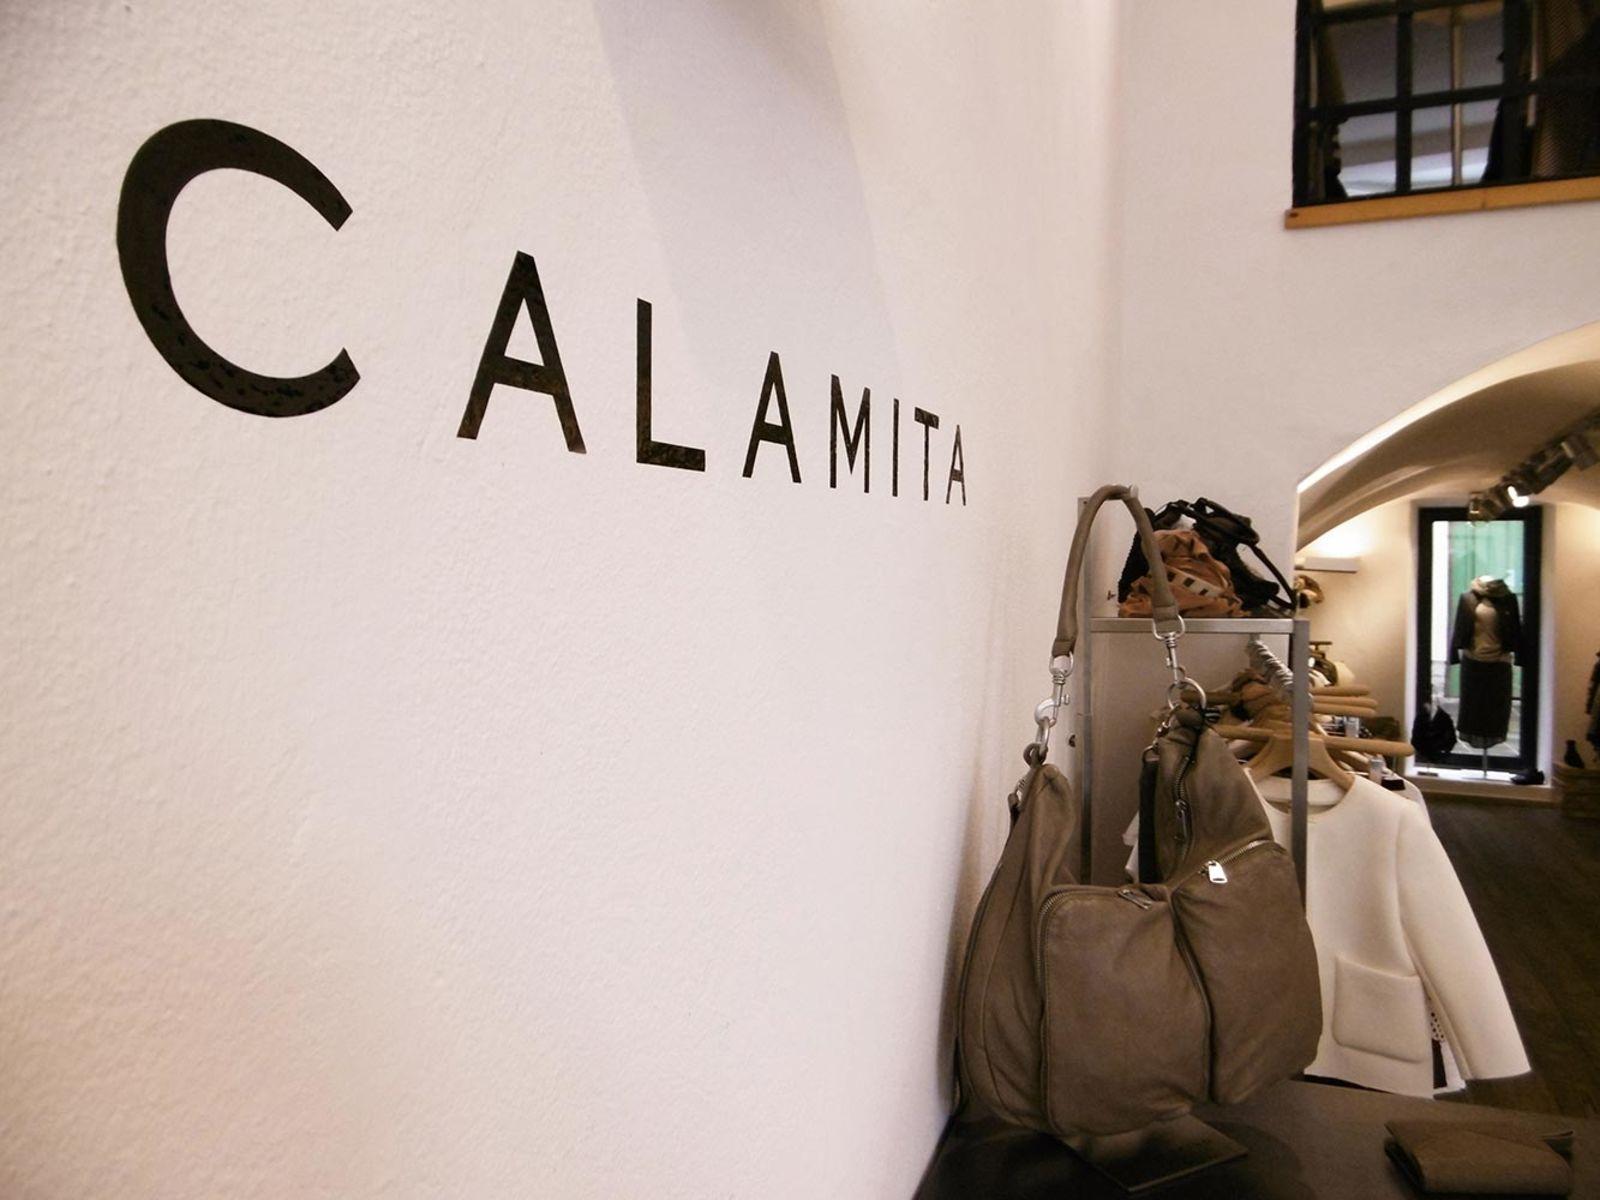 CALAMITA in Innsbruck (Bild 9)